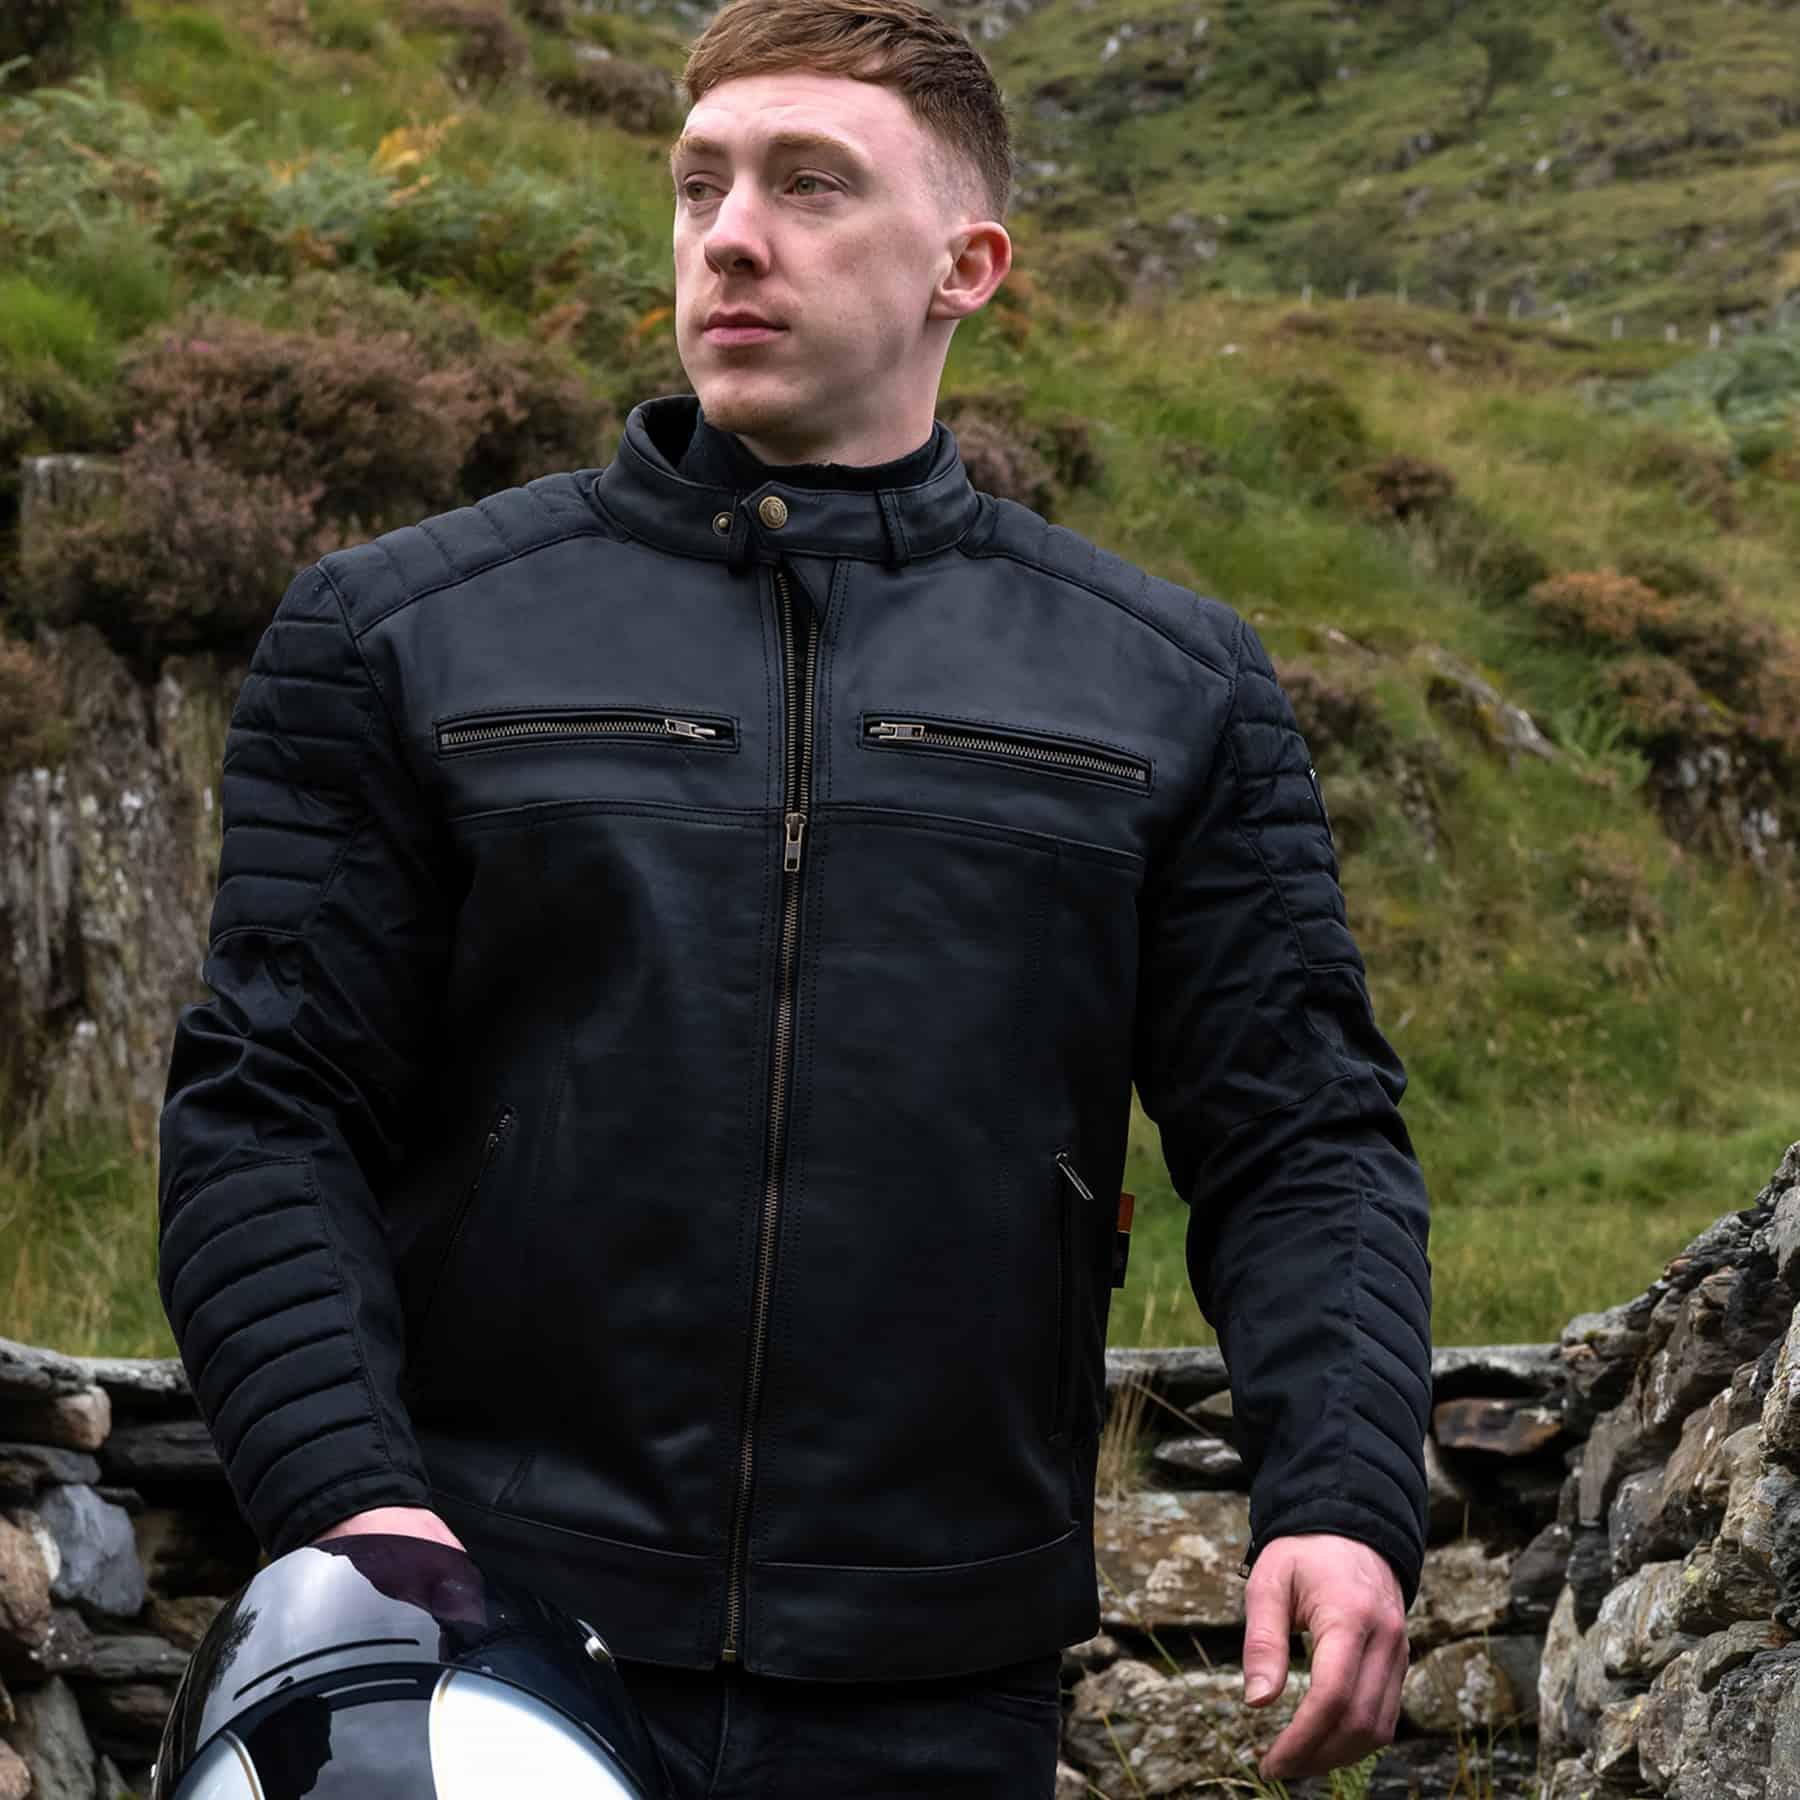 Merlin Ridge Cotec and Leather jacket